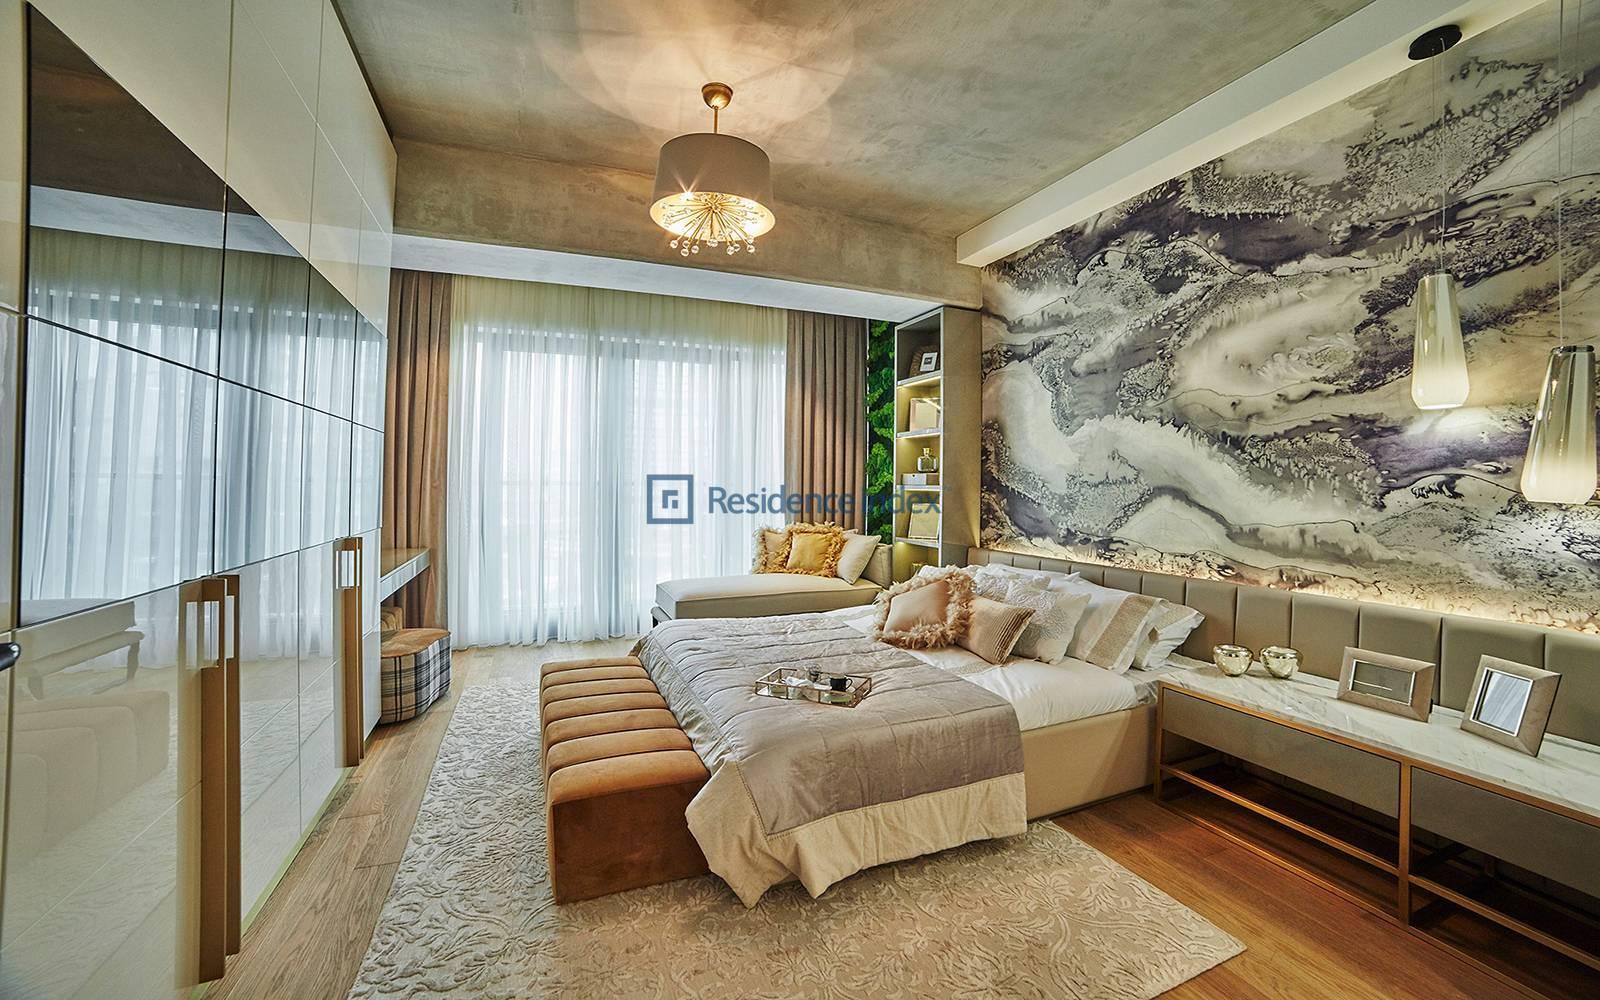 Excellent Bosphorus View For sale 2 + 1 Apartment